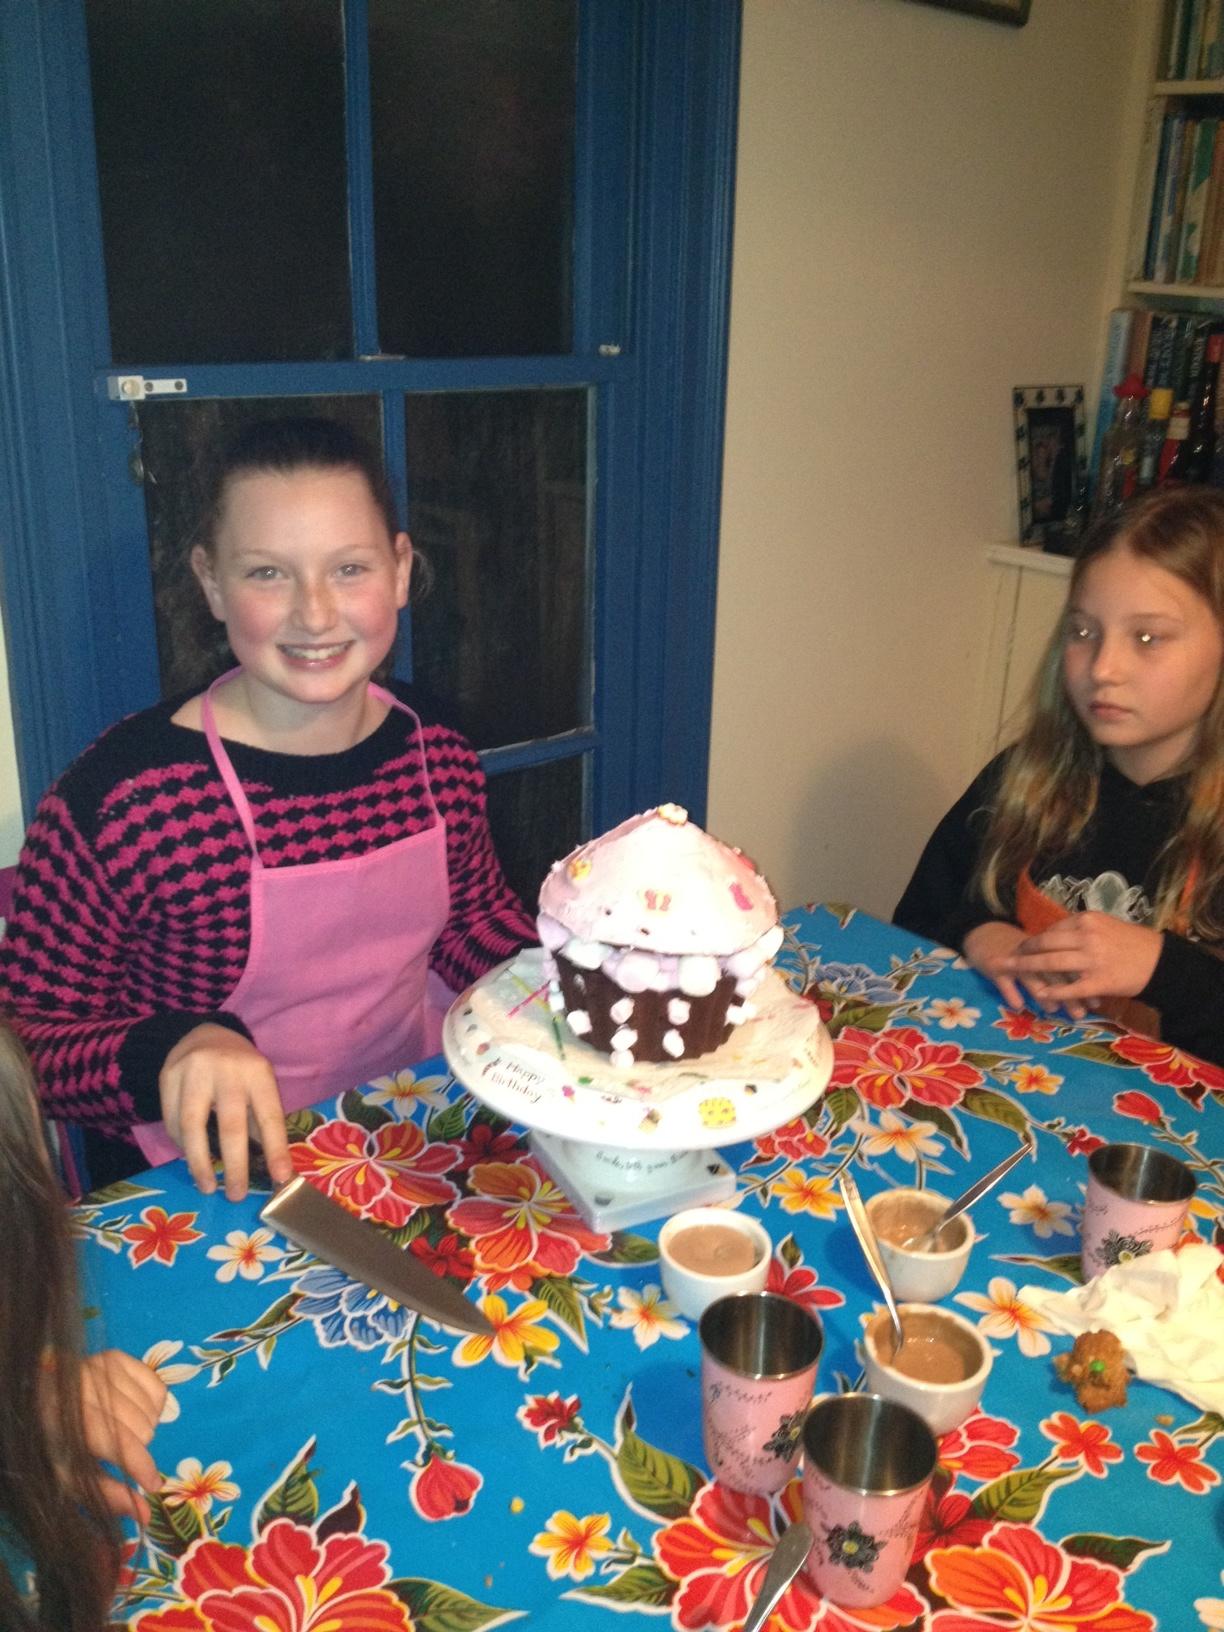 Brigitte's party